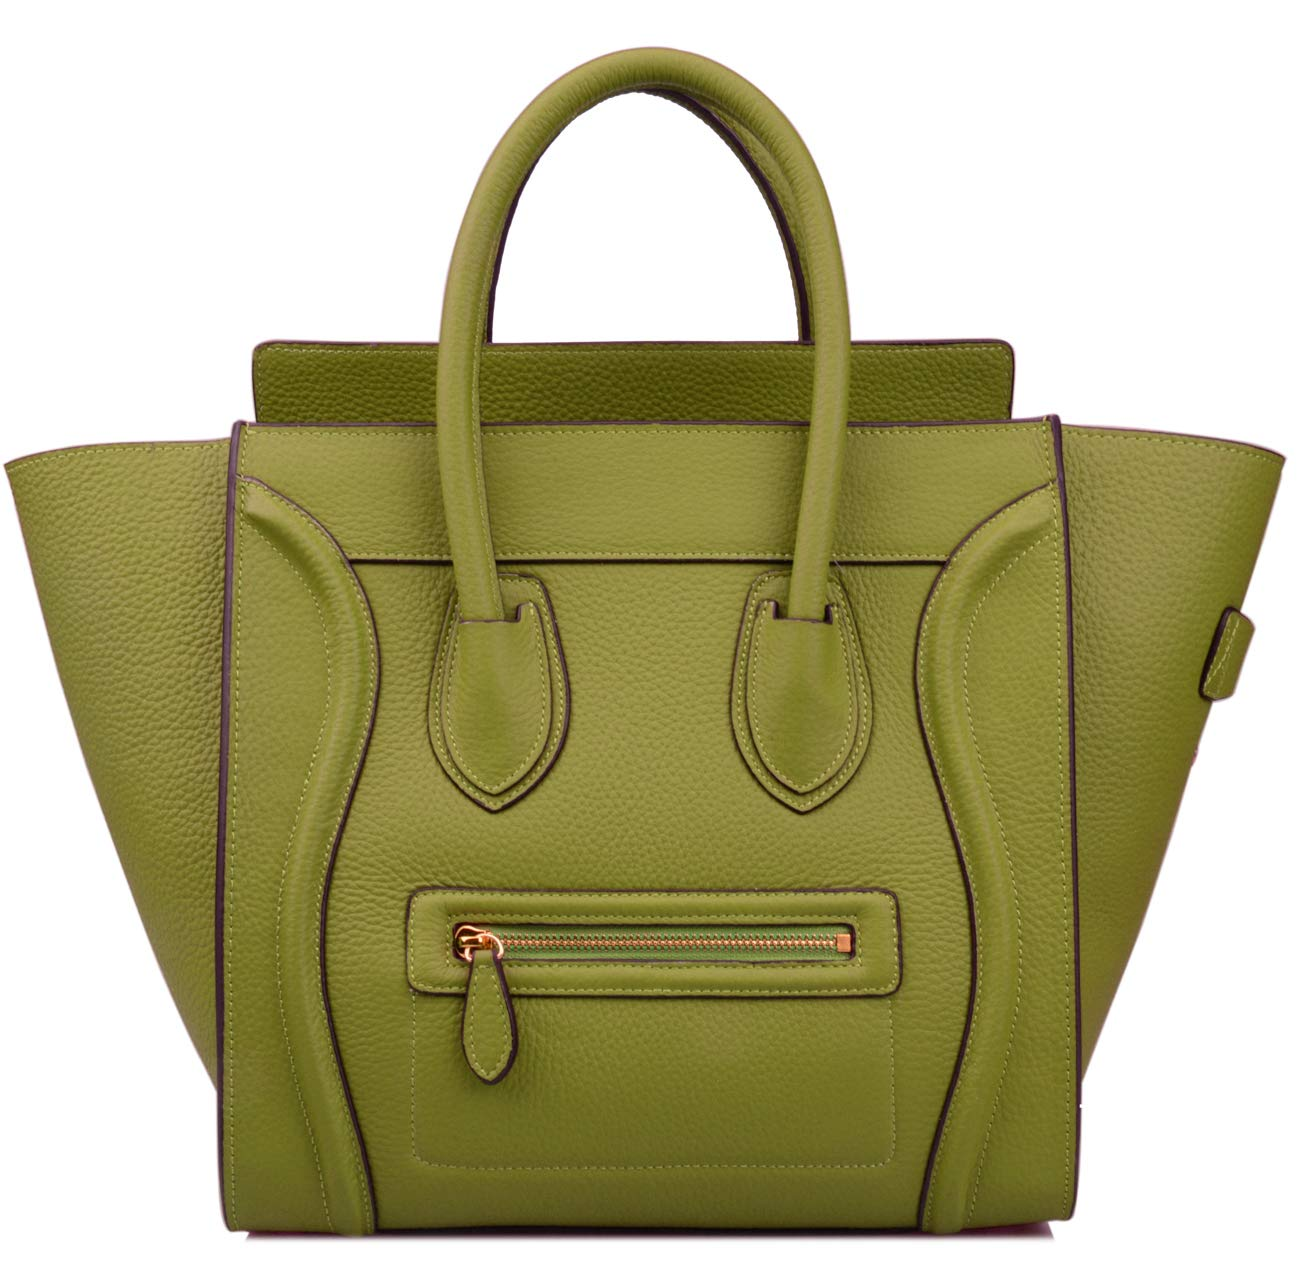 Ainifeel Women's Genuine Leather Smile Large Top Handle Handbag Purse (Large, Olive green)